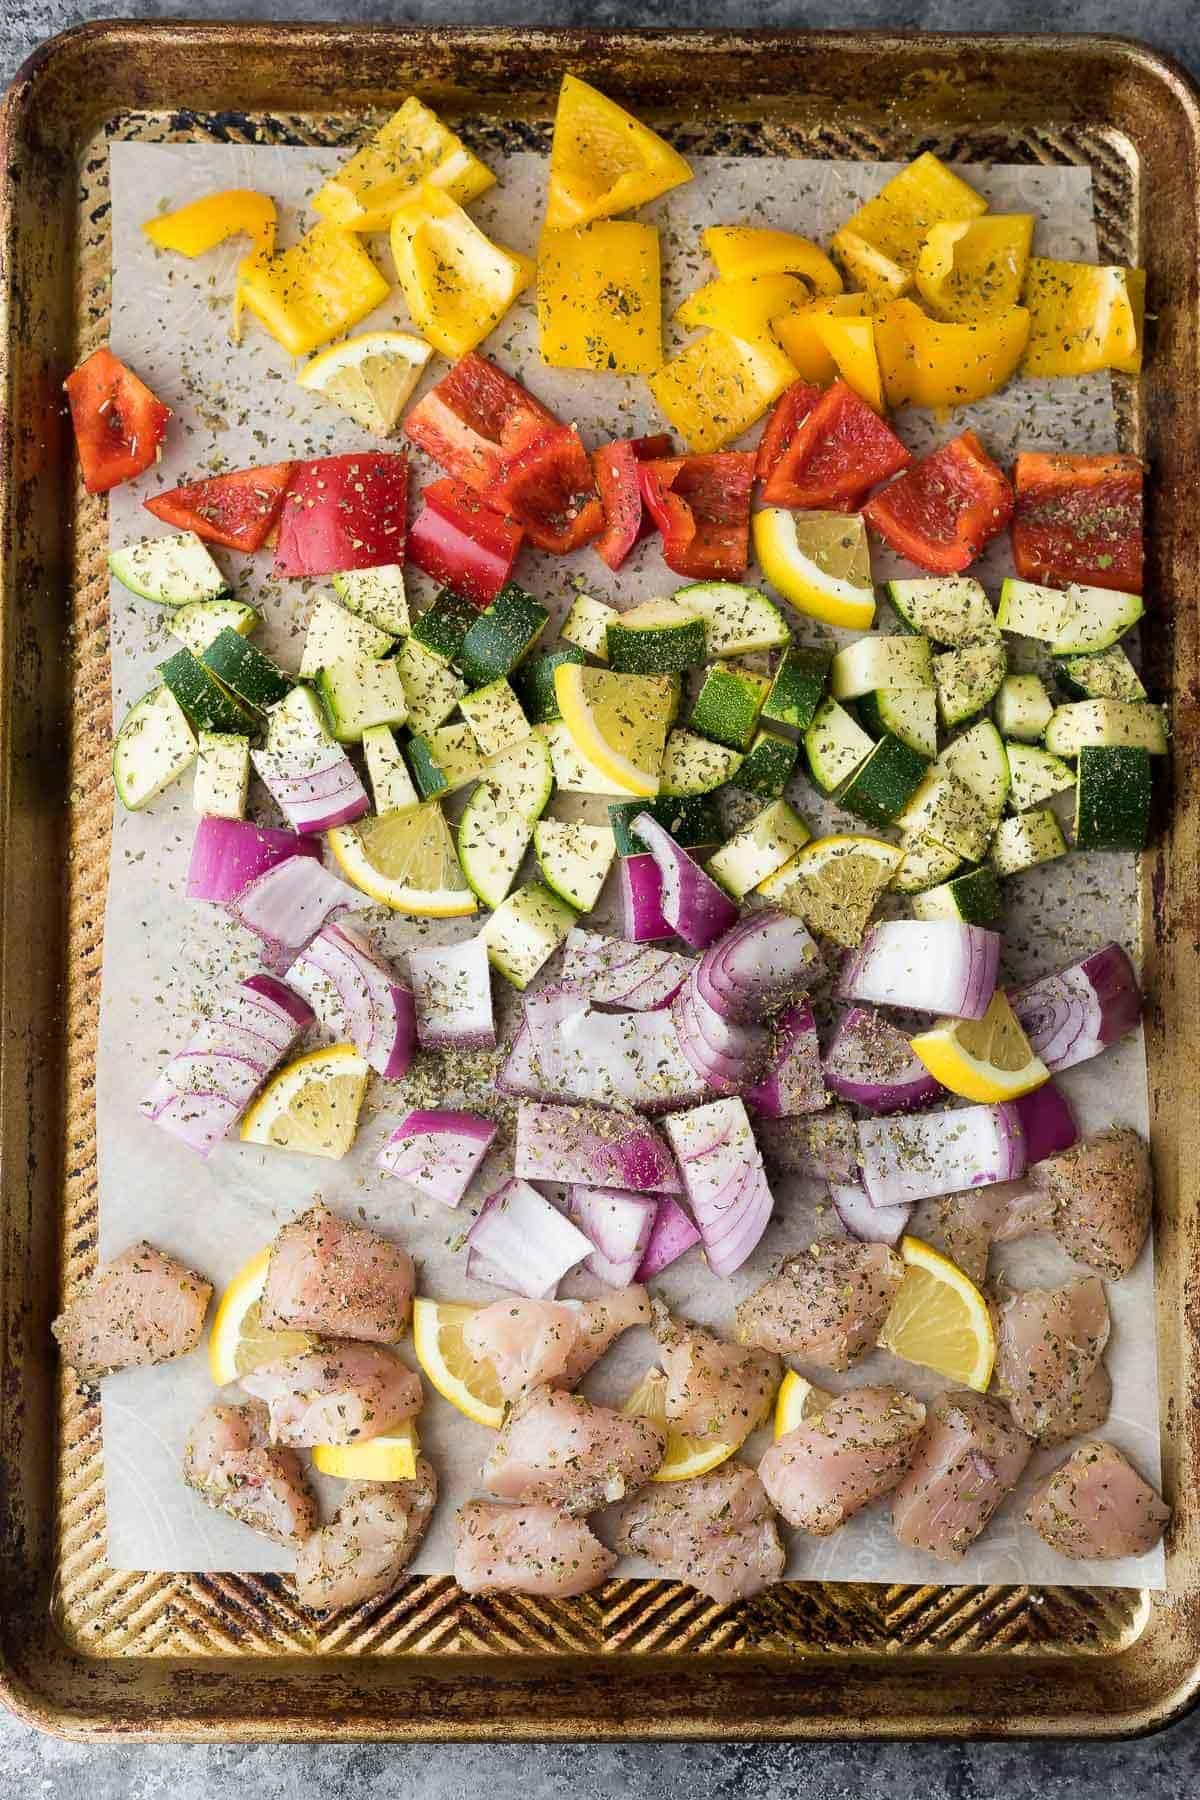 Greek chicken seasoning on a sheet pan sprinkled over raw veggies and chicken